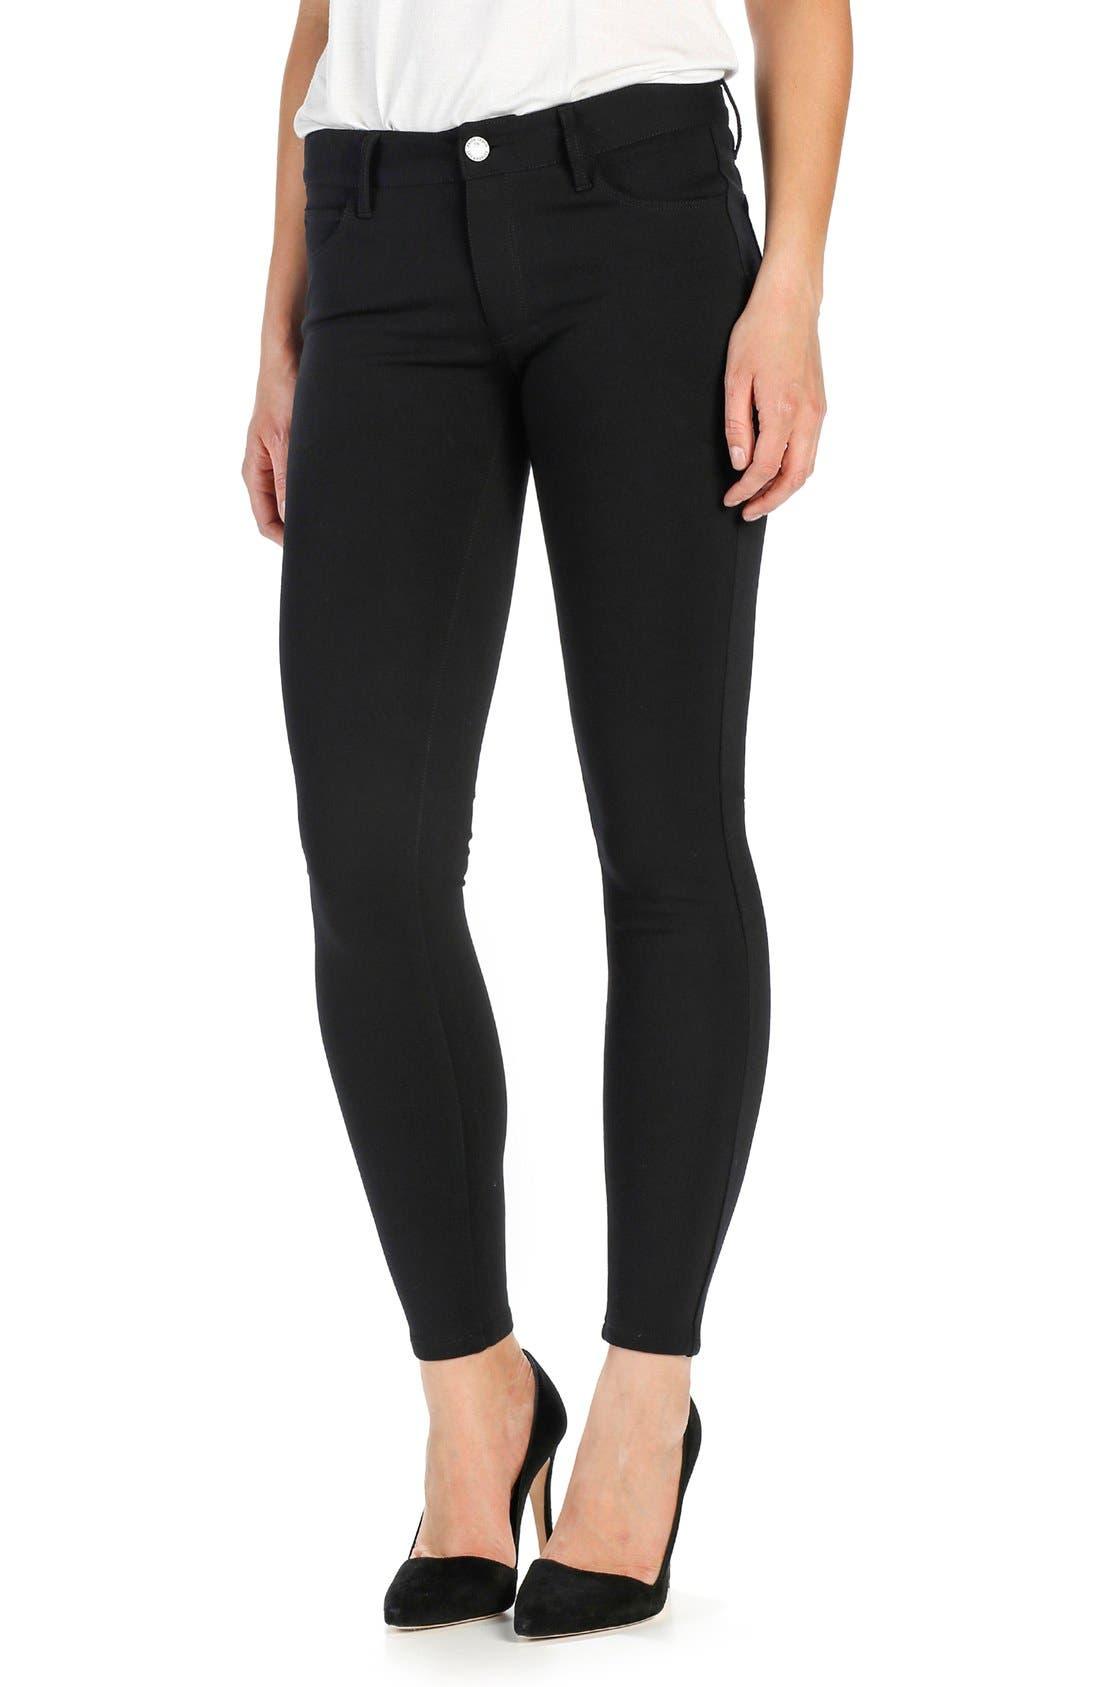 'Verdugo' Ponte Ankle Pants,                             Main thumbnail 1, color,                             BLACK